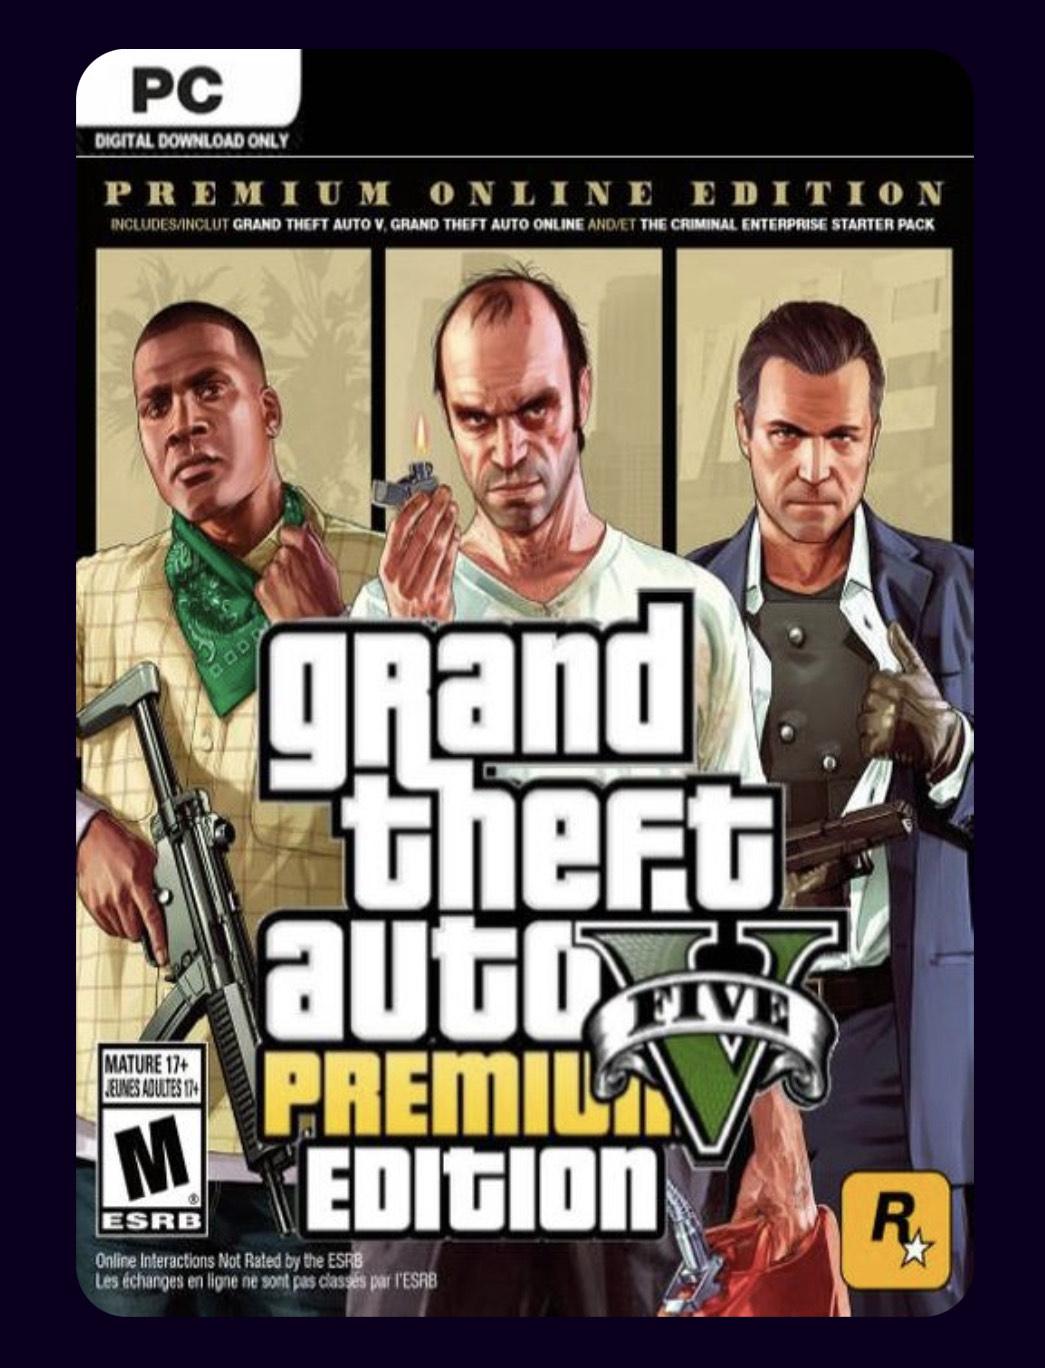 GTA V PREMIUM ONLINE EDITION PC